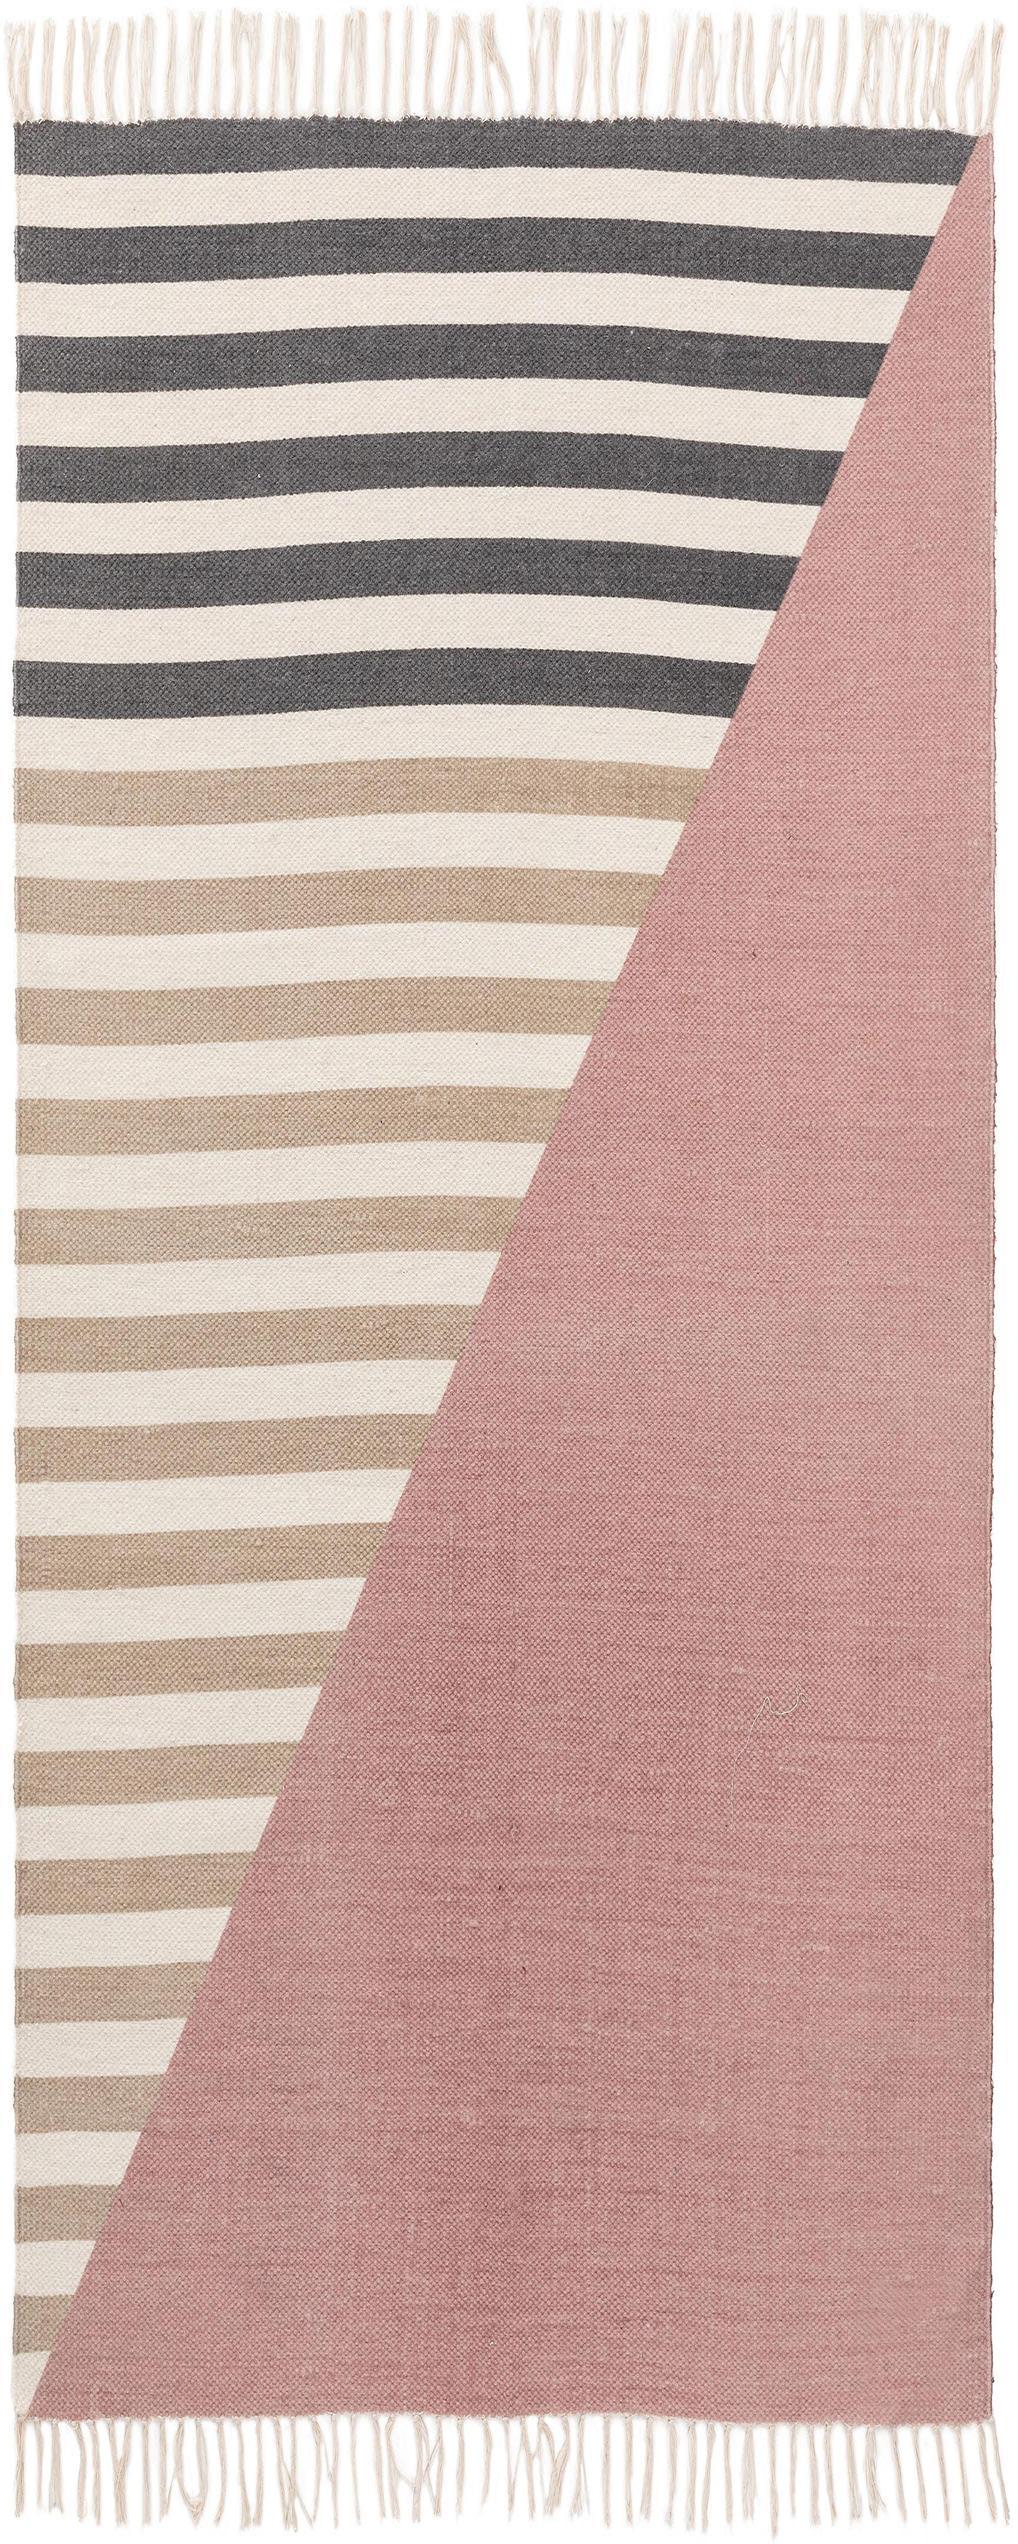 Wollen vloerkleed Oasis met strepen en franjes, 100% wol, Roze, beige, taupe, B 60 x L 120 cm (maat XS)